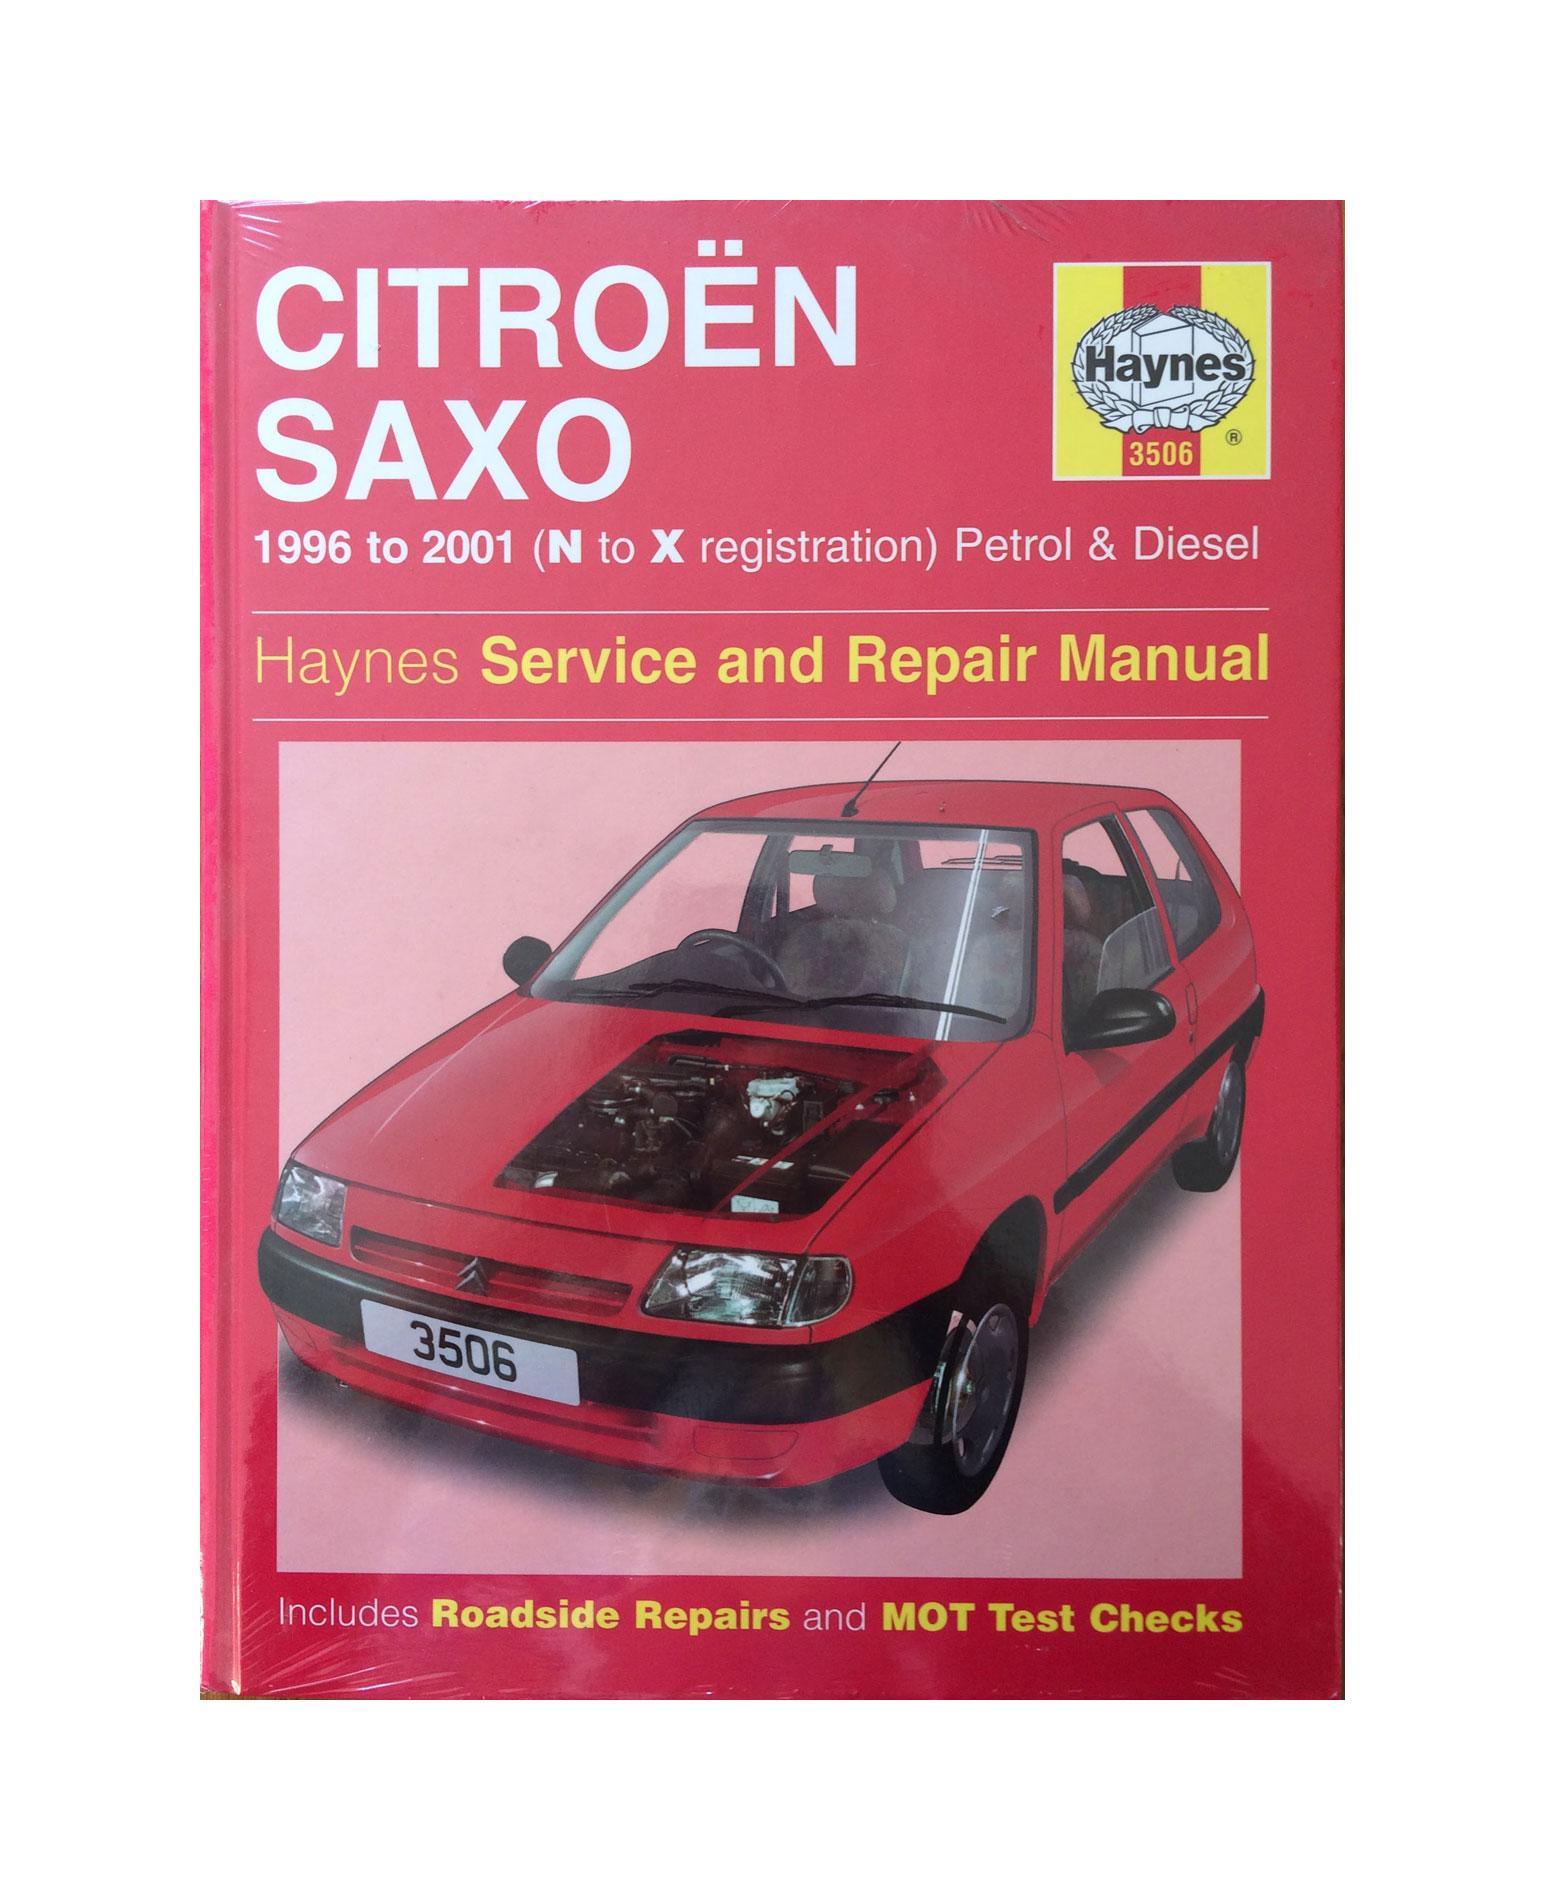 Citroen Saxo N - X reg. Petrol & Diesel - Haynes Service & Repair Manual